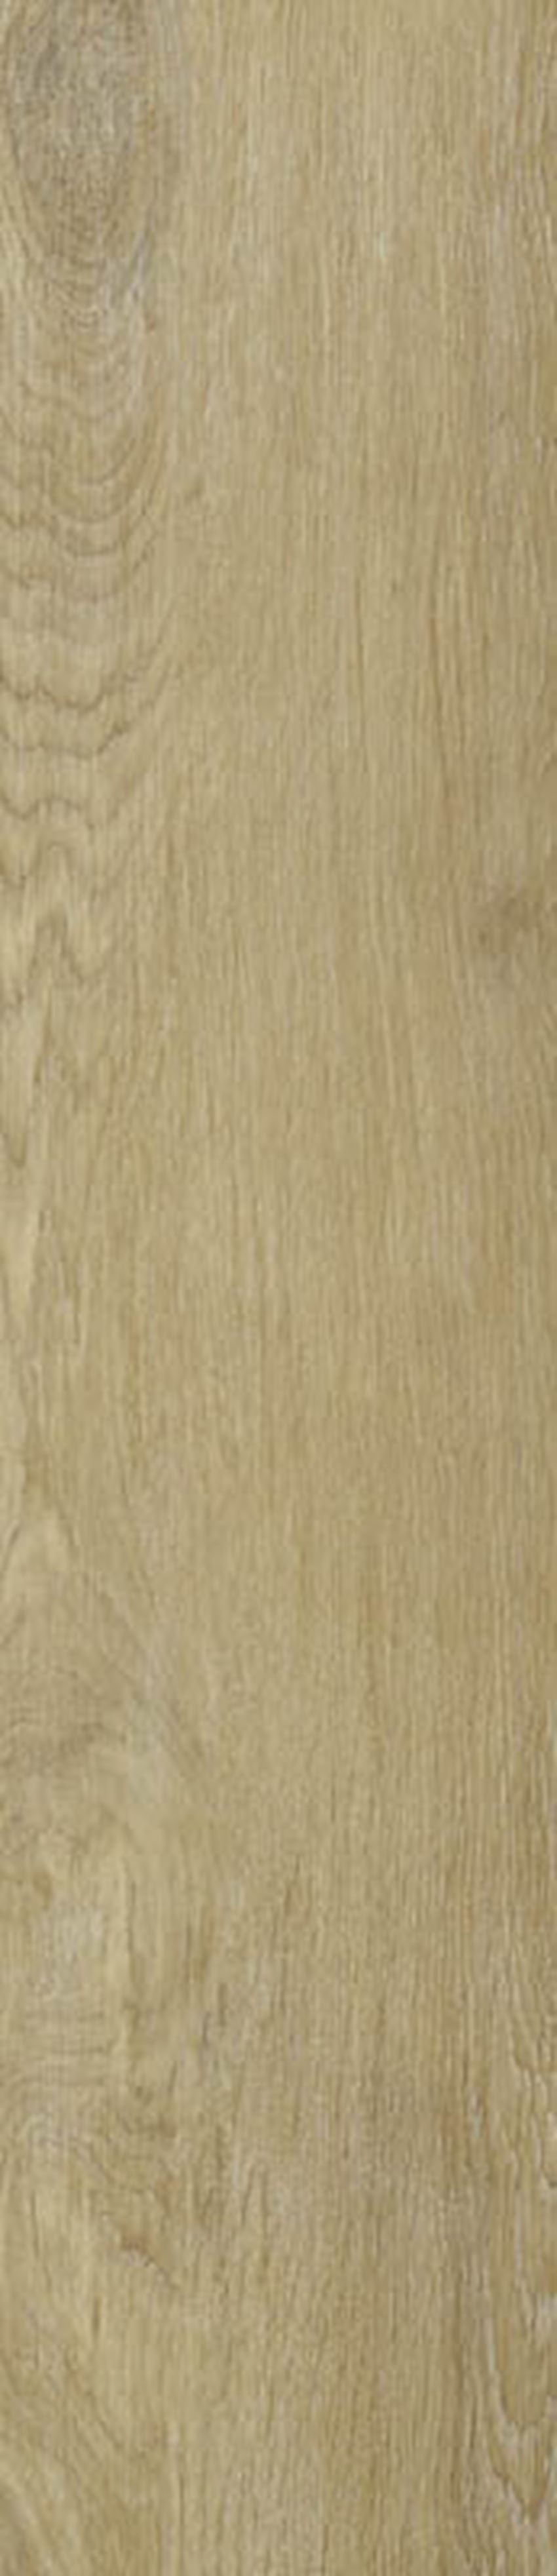 Płytka ścienno-podłogowa 19,4x90 cm Paradyż Roble Naturale Gres Szkl. Rekt. Mat.